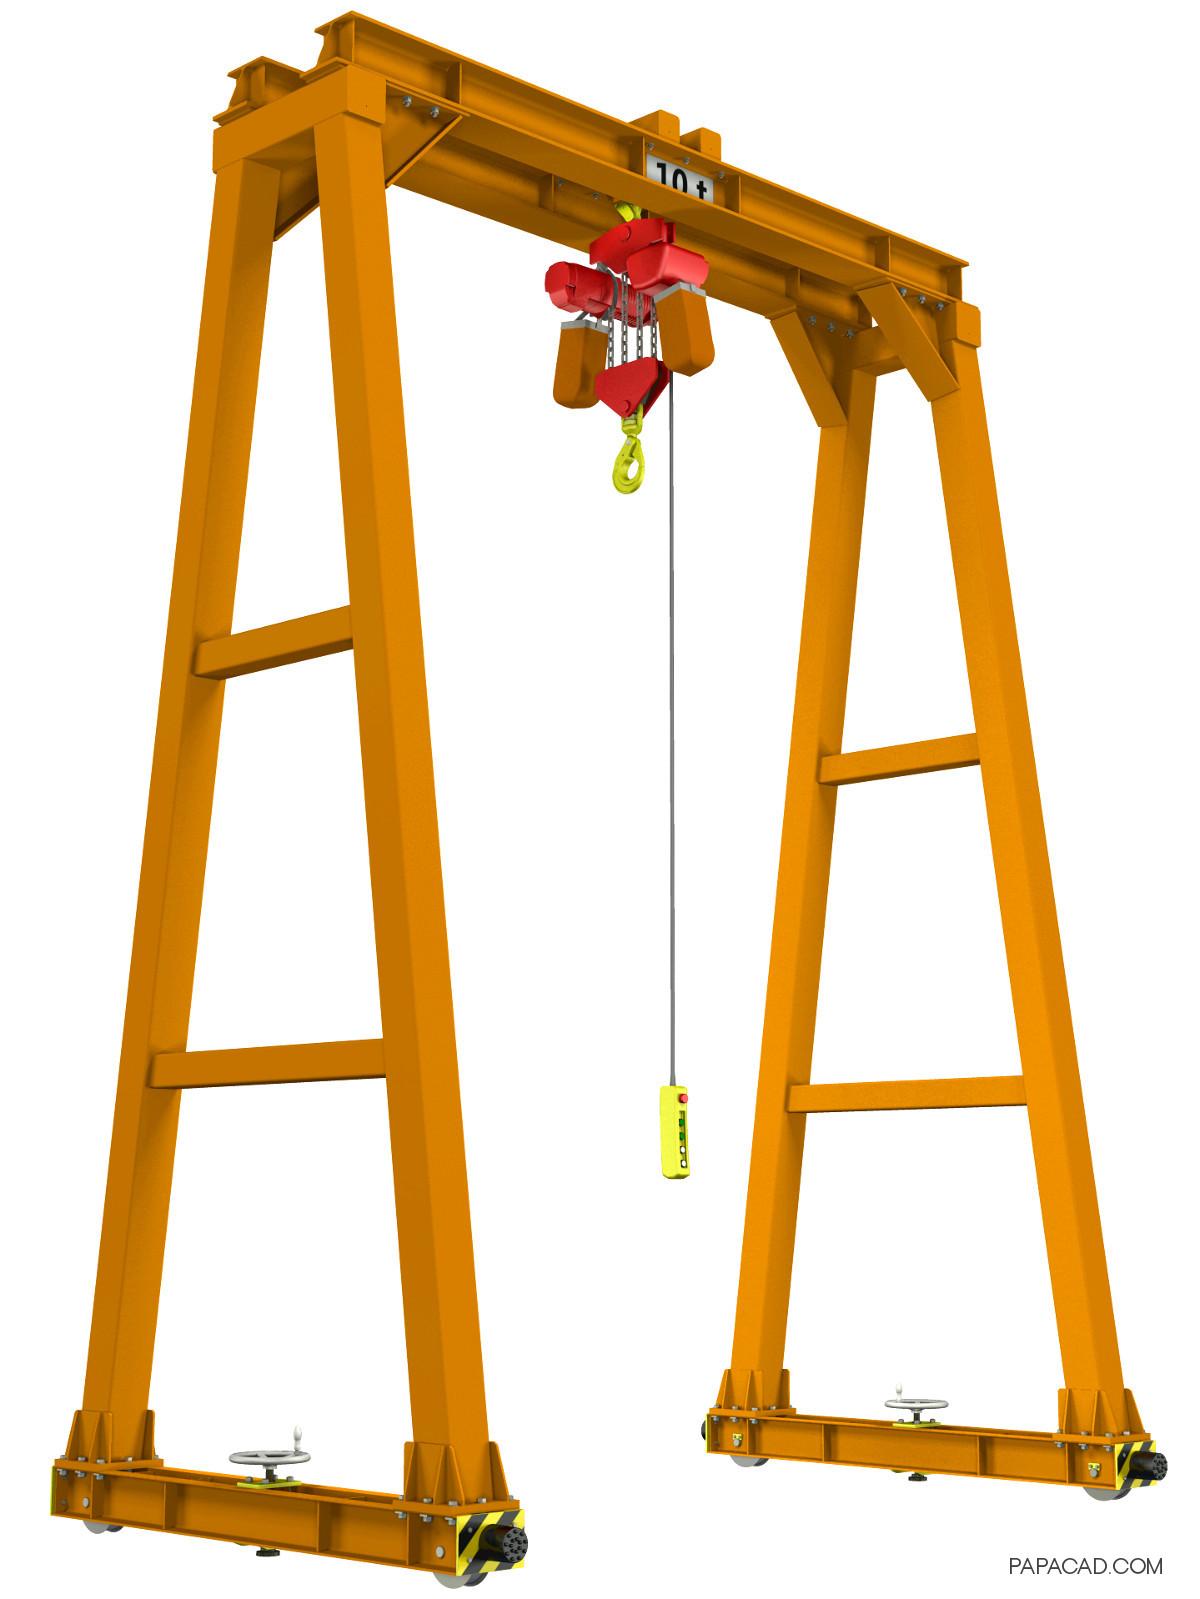 10t Gantry Crane DIY CAD project